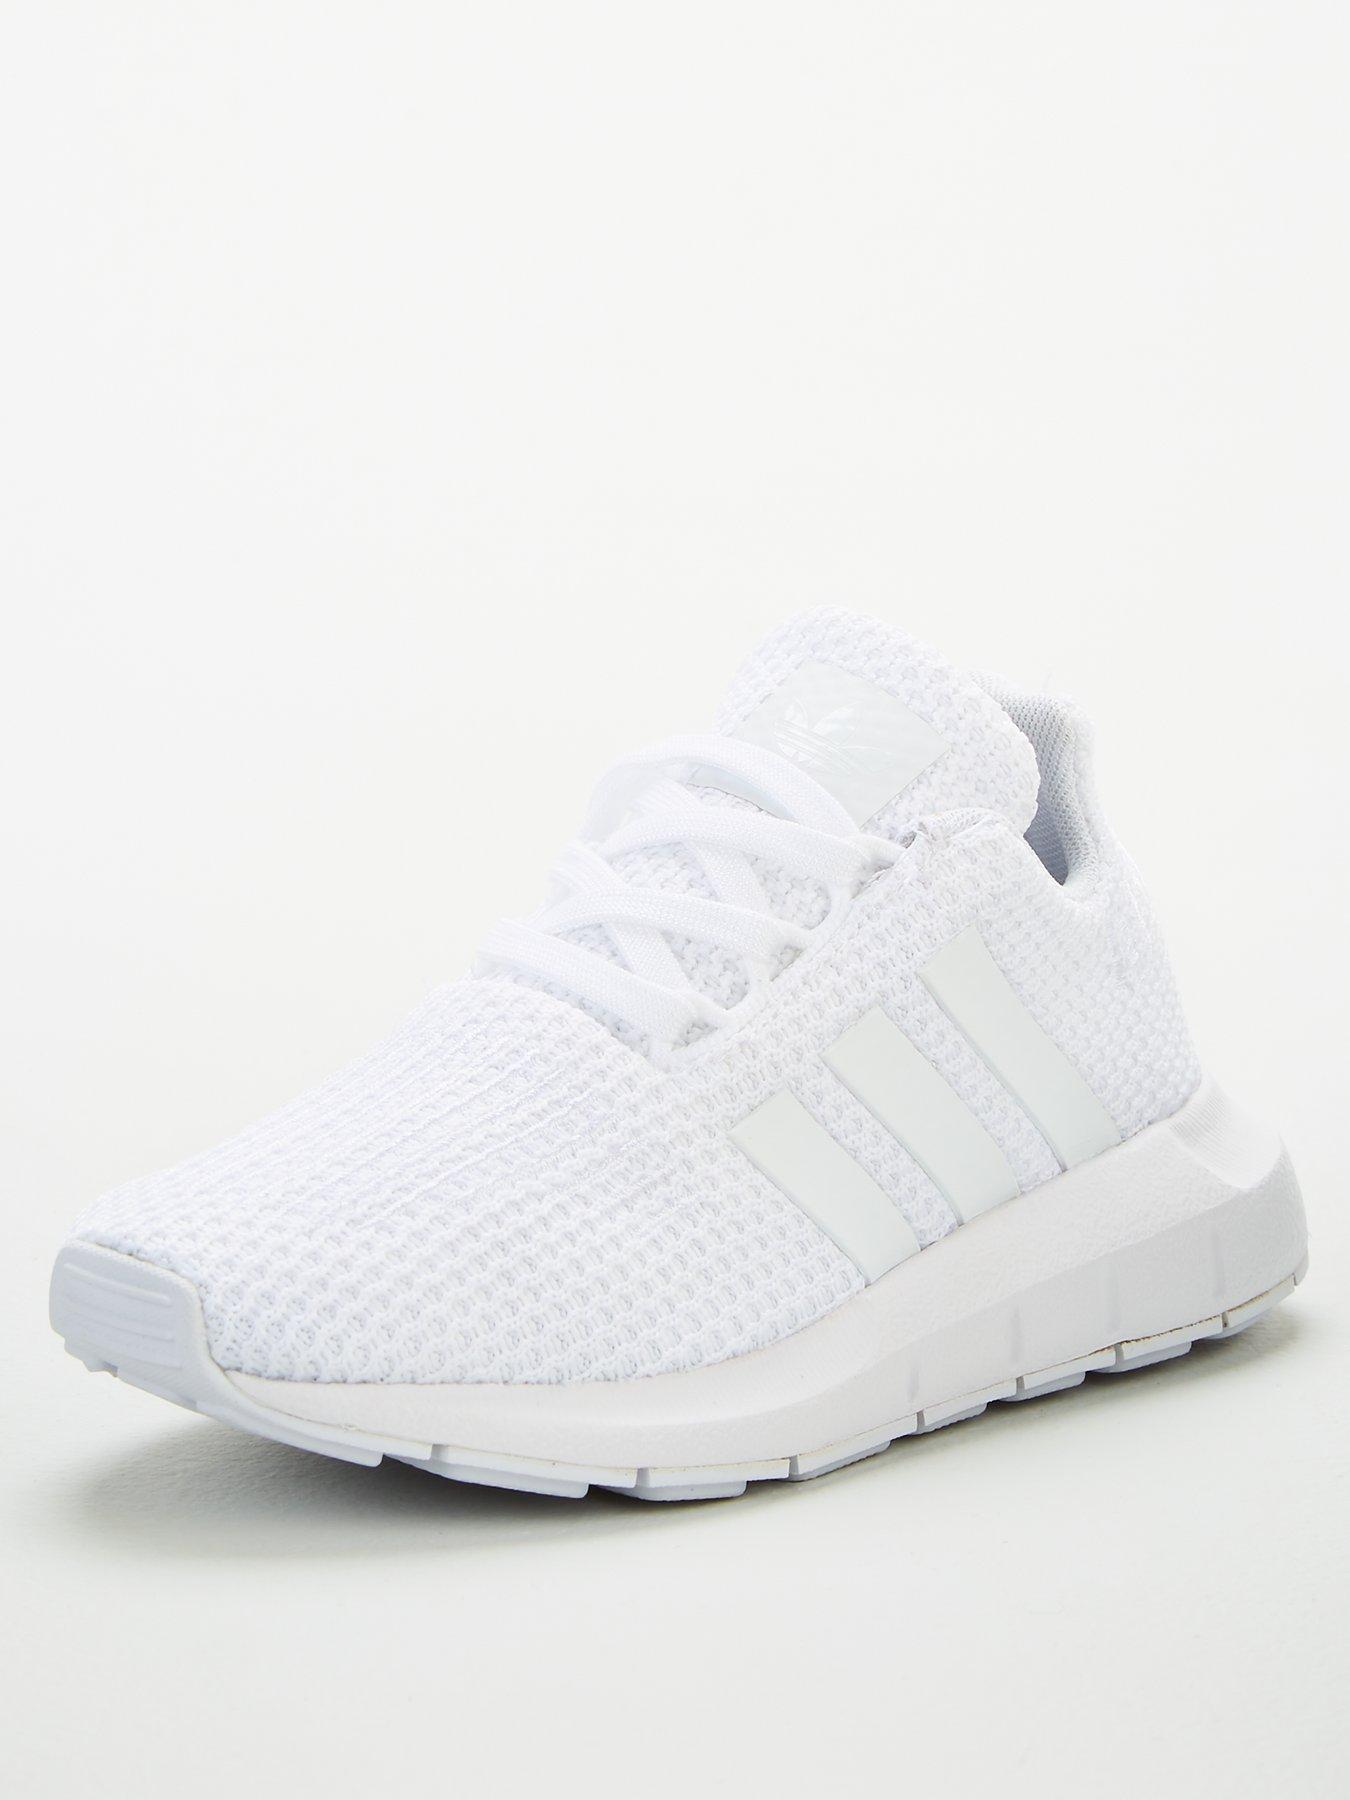 swift run adidas black 38 2 3